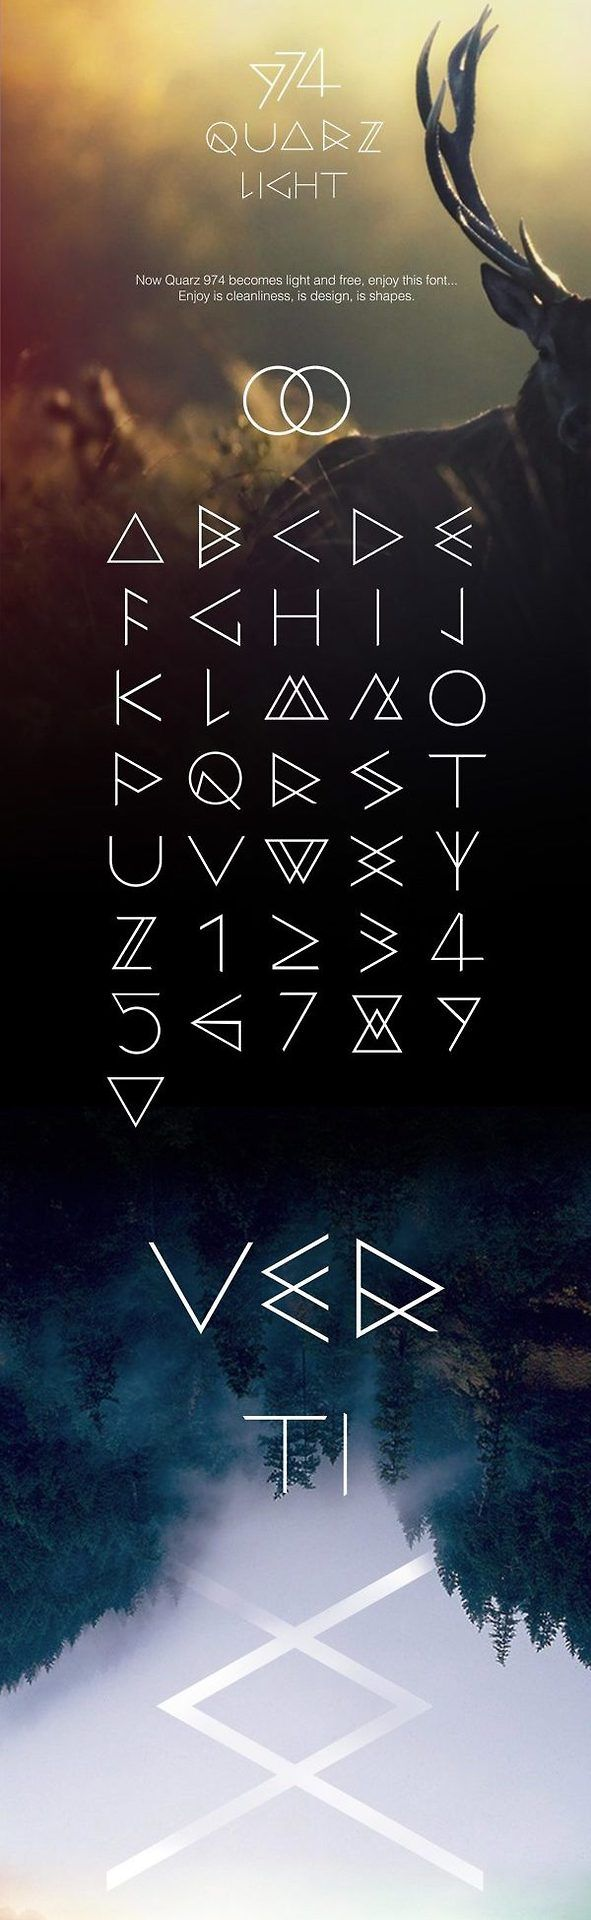 QUARZ 974 Light - Free Font